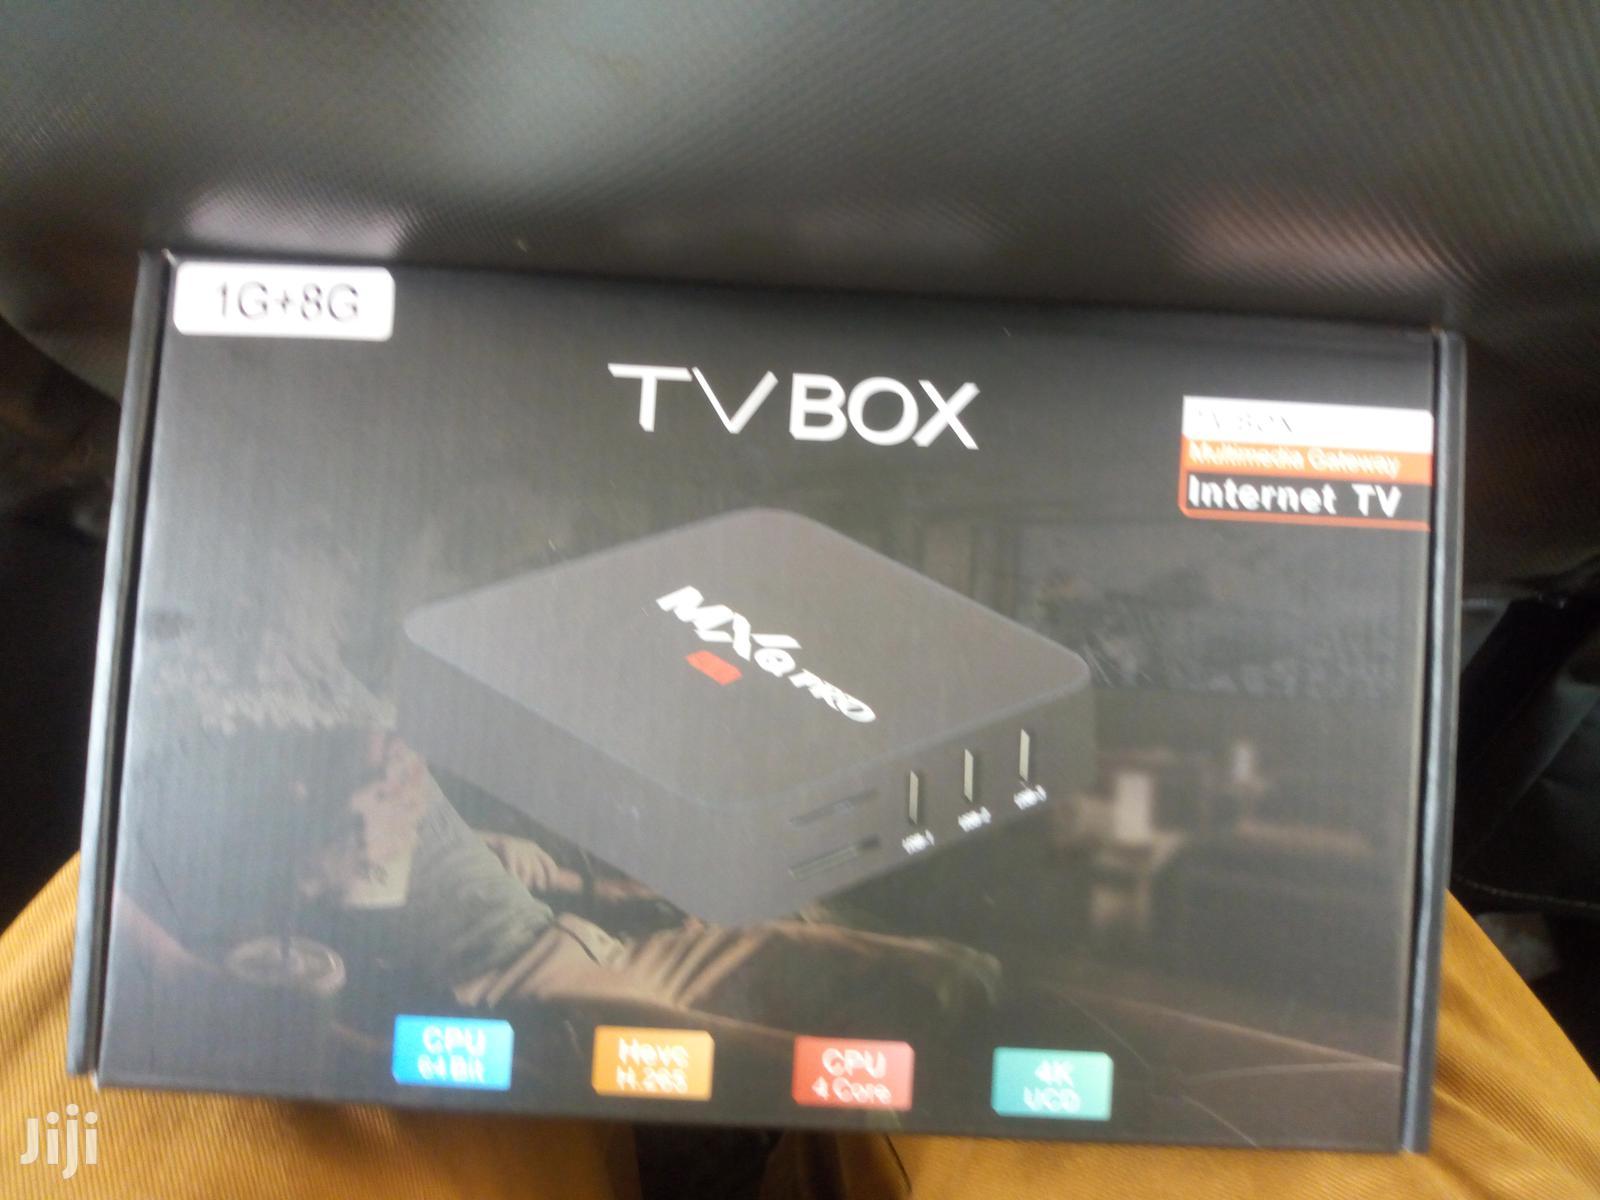 Archive: Mxq Pro 4k TV Android Box 1GB RAM 8GB Internal